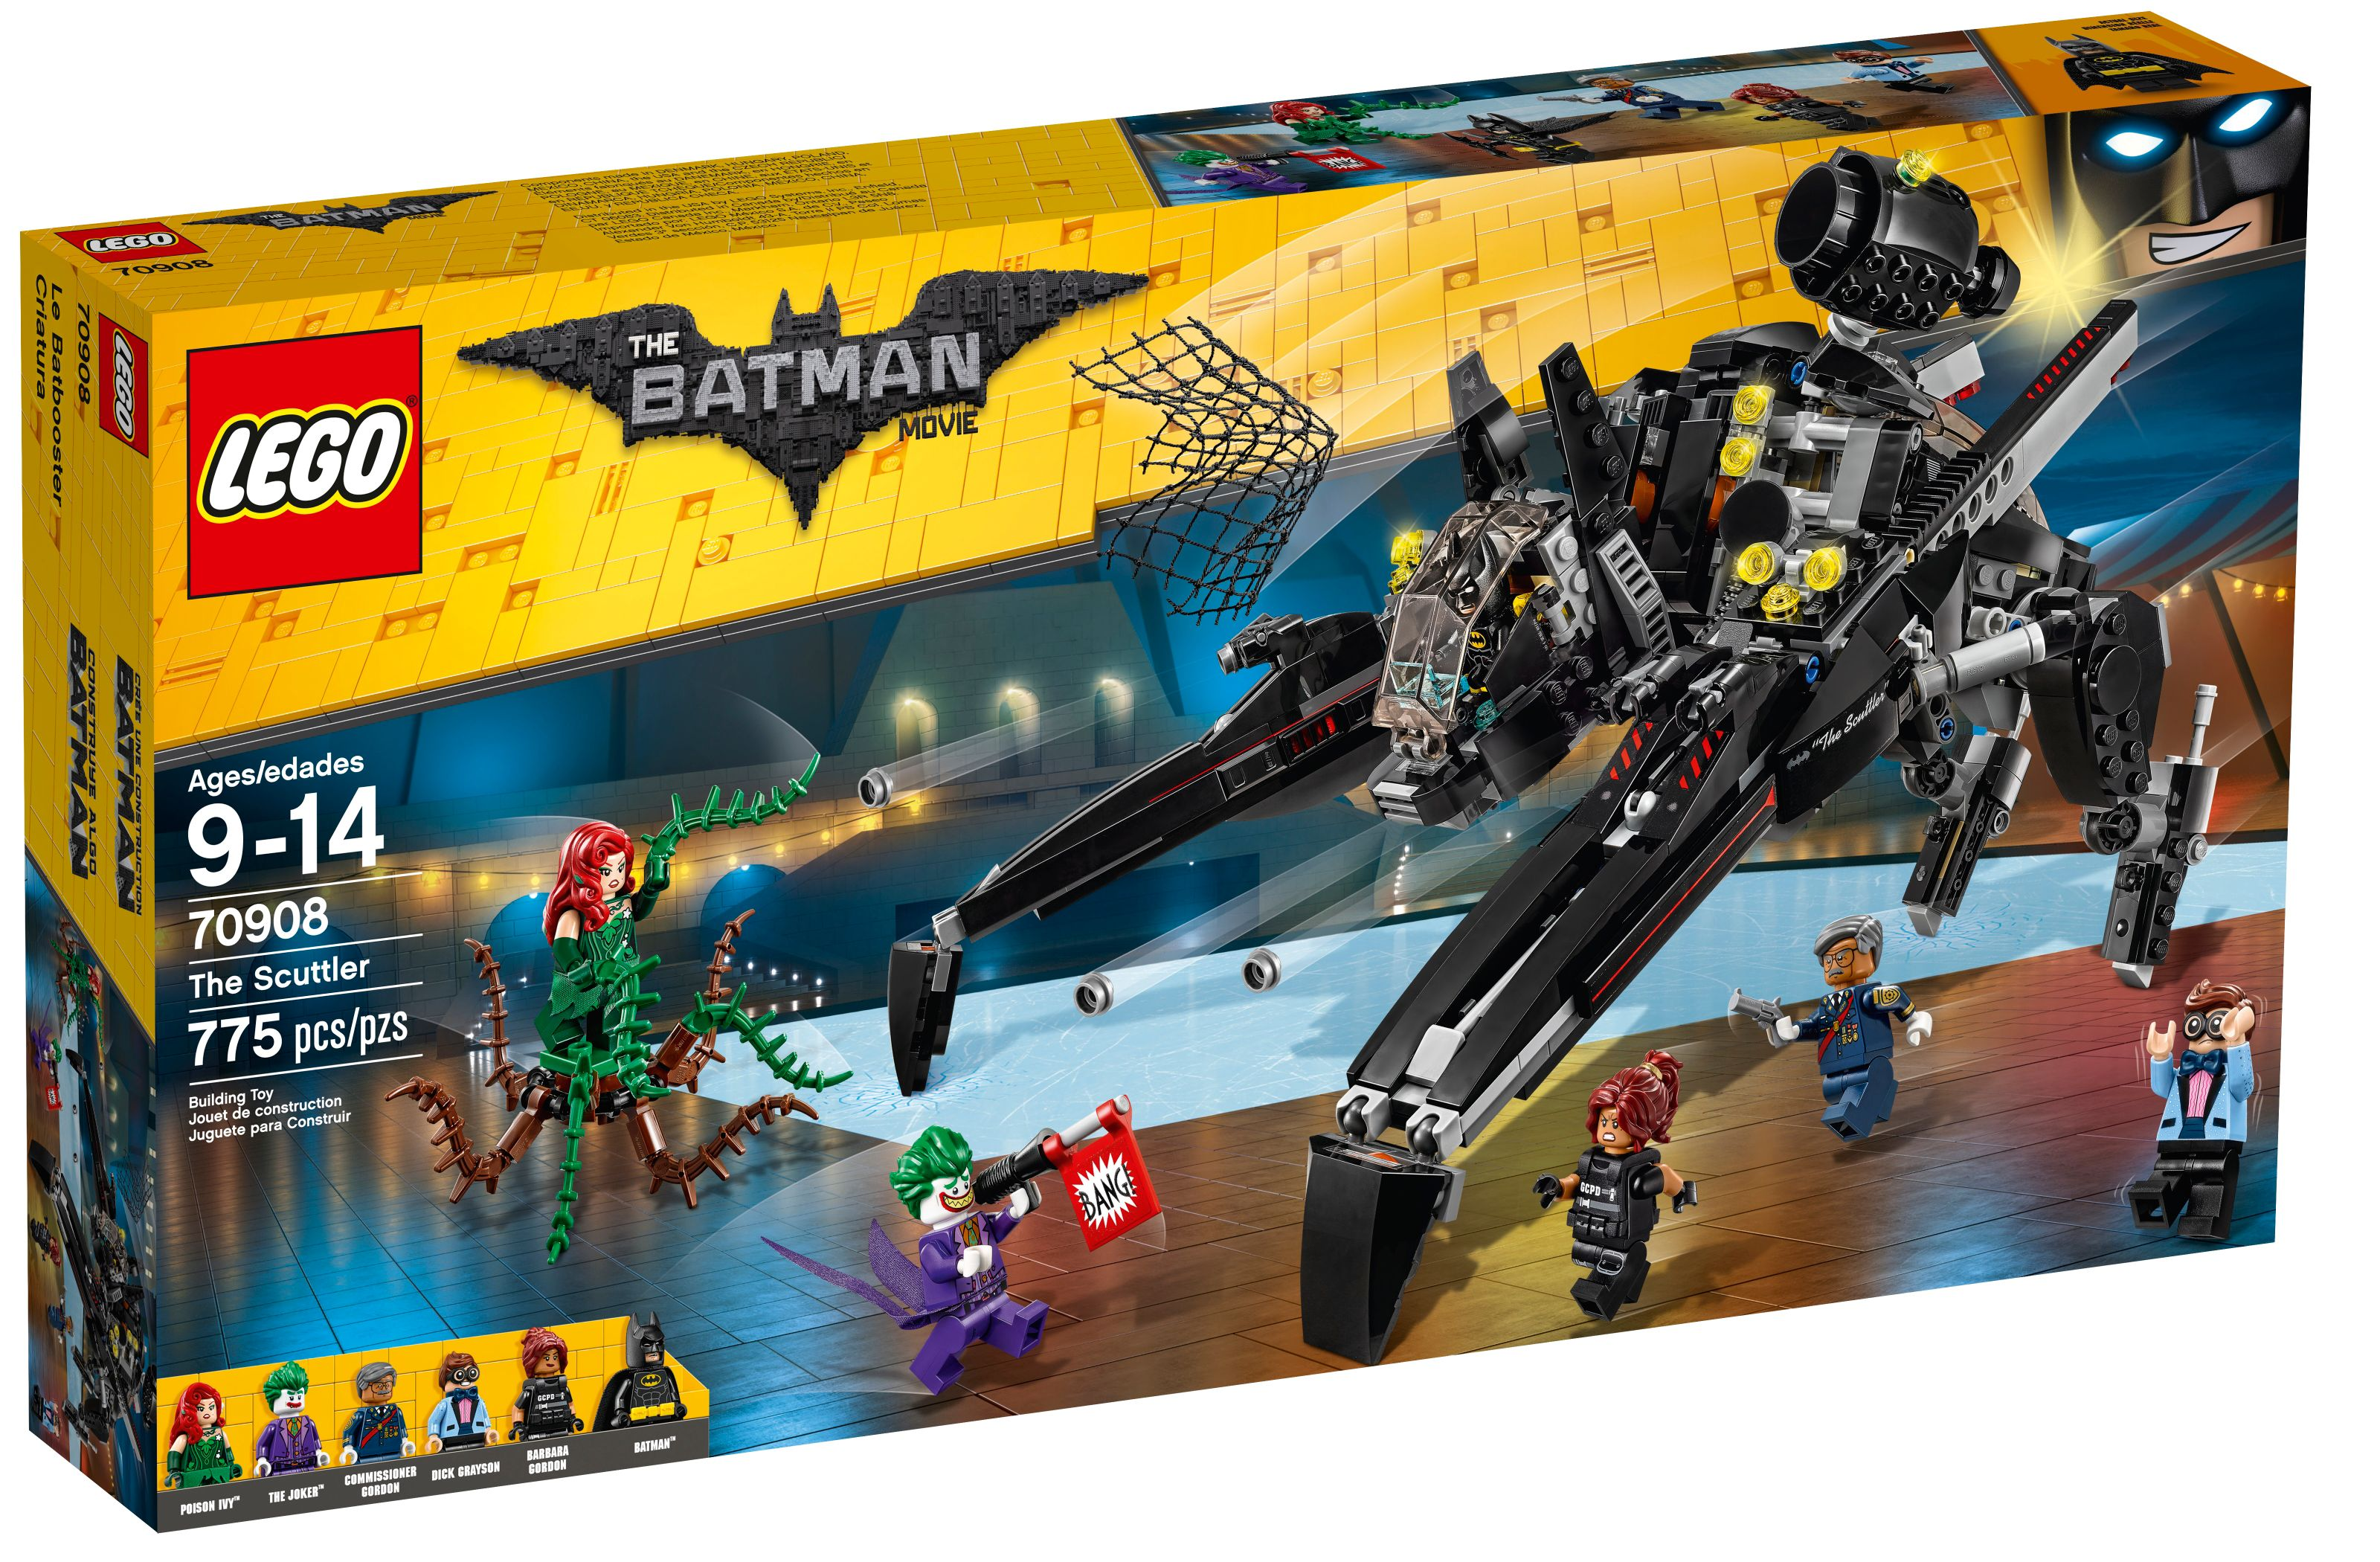 The LEGO Batman Movie Sets On Sale - FBTB Lego Batman 2 Sets